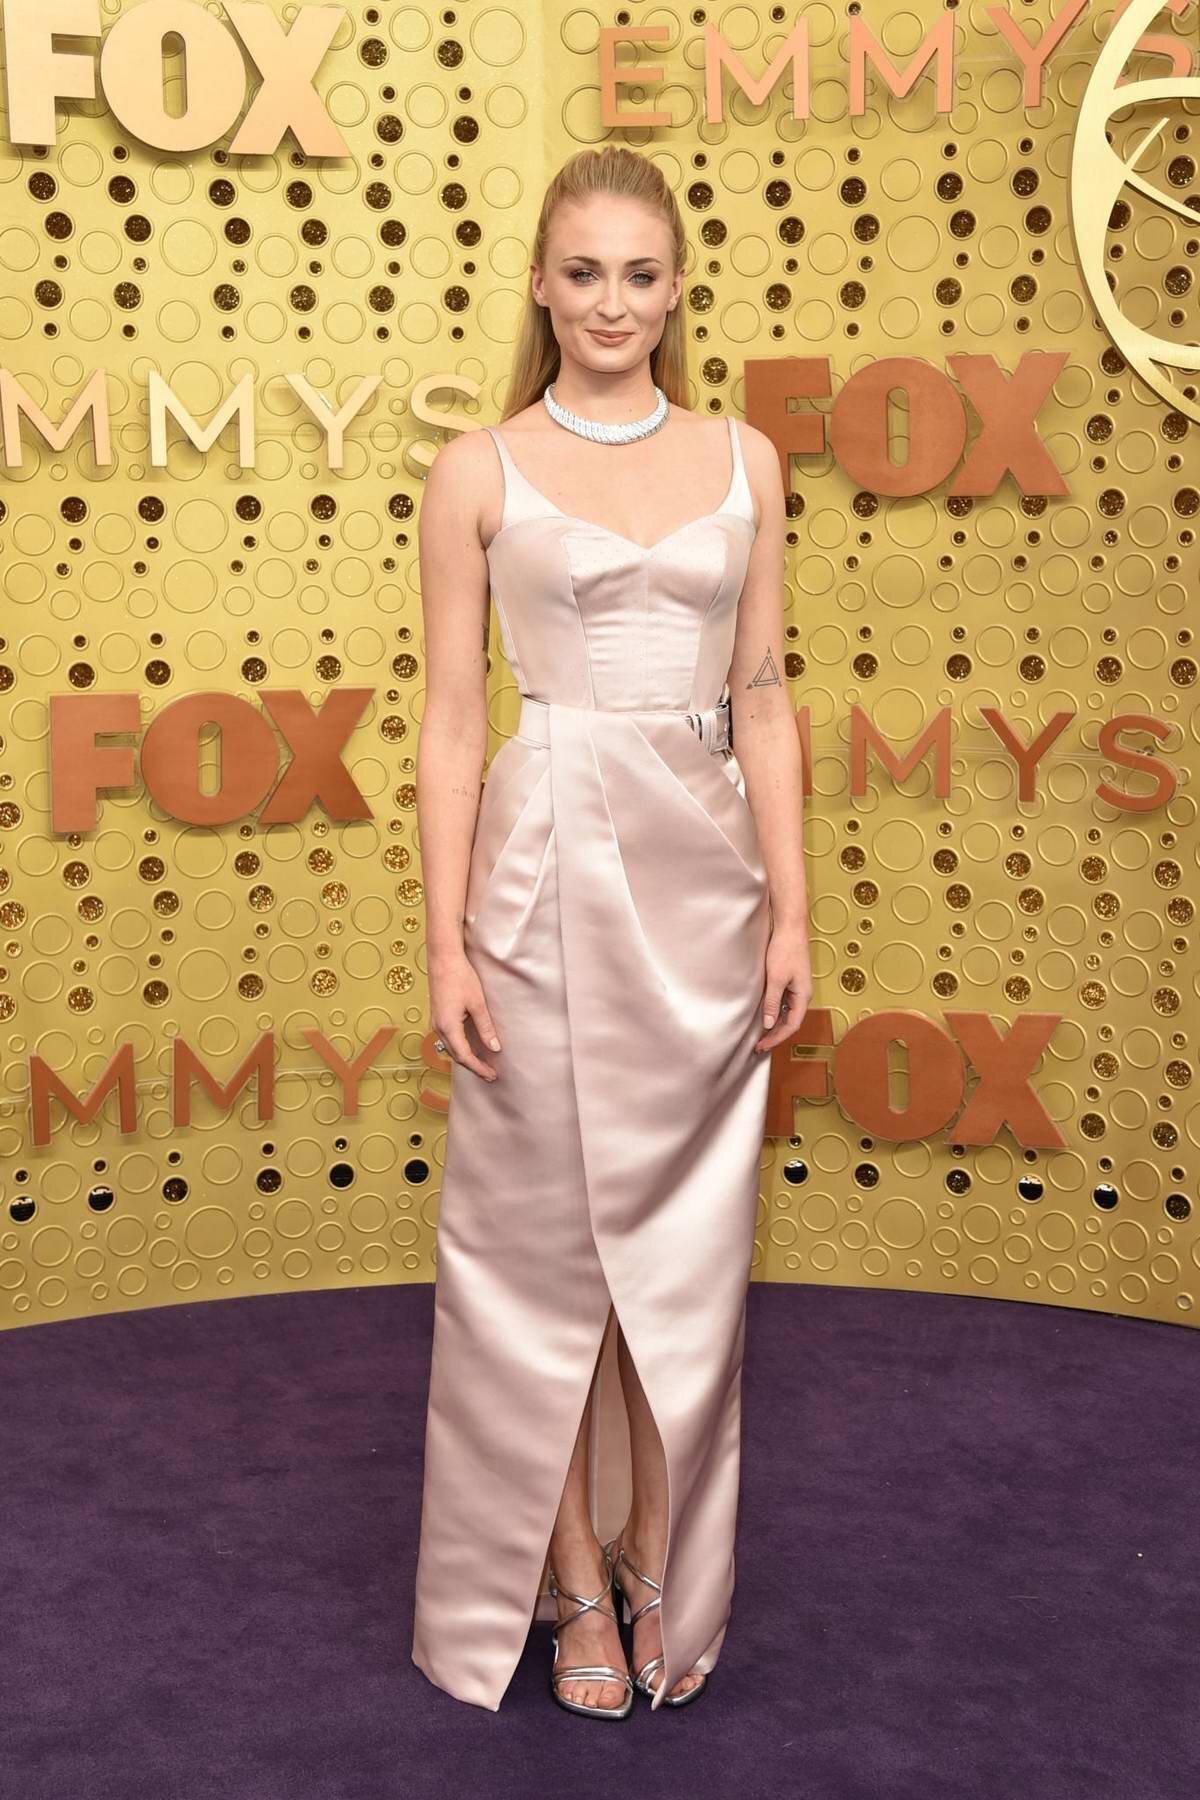 Sophie Turner. Photo Source: Celebs First